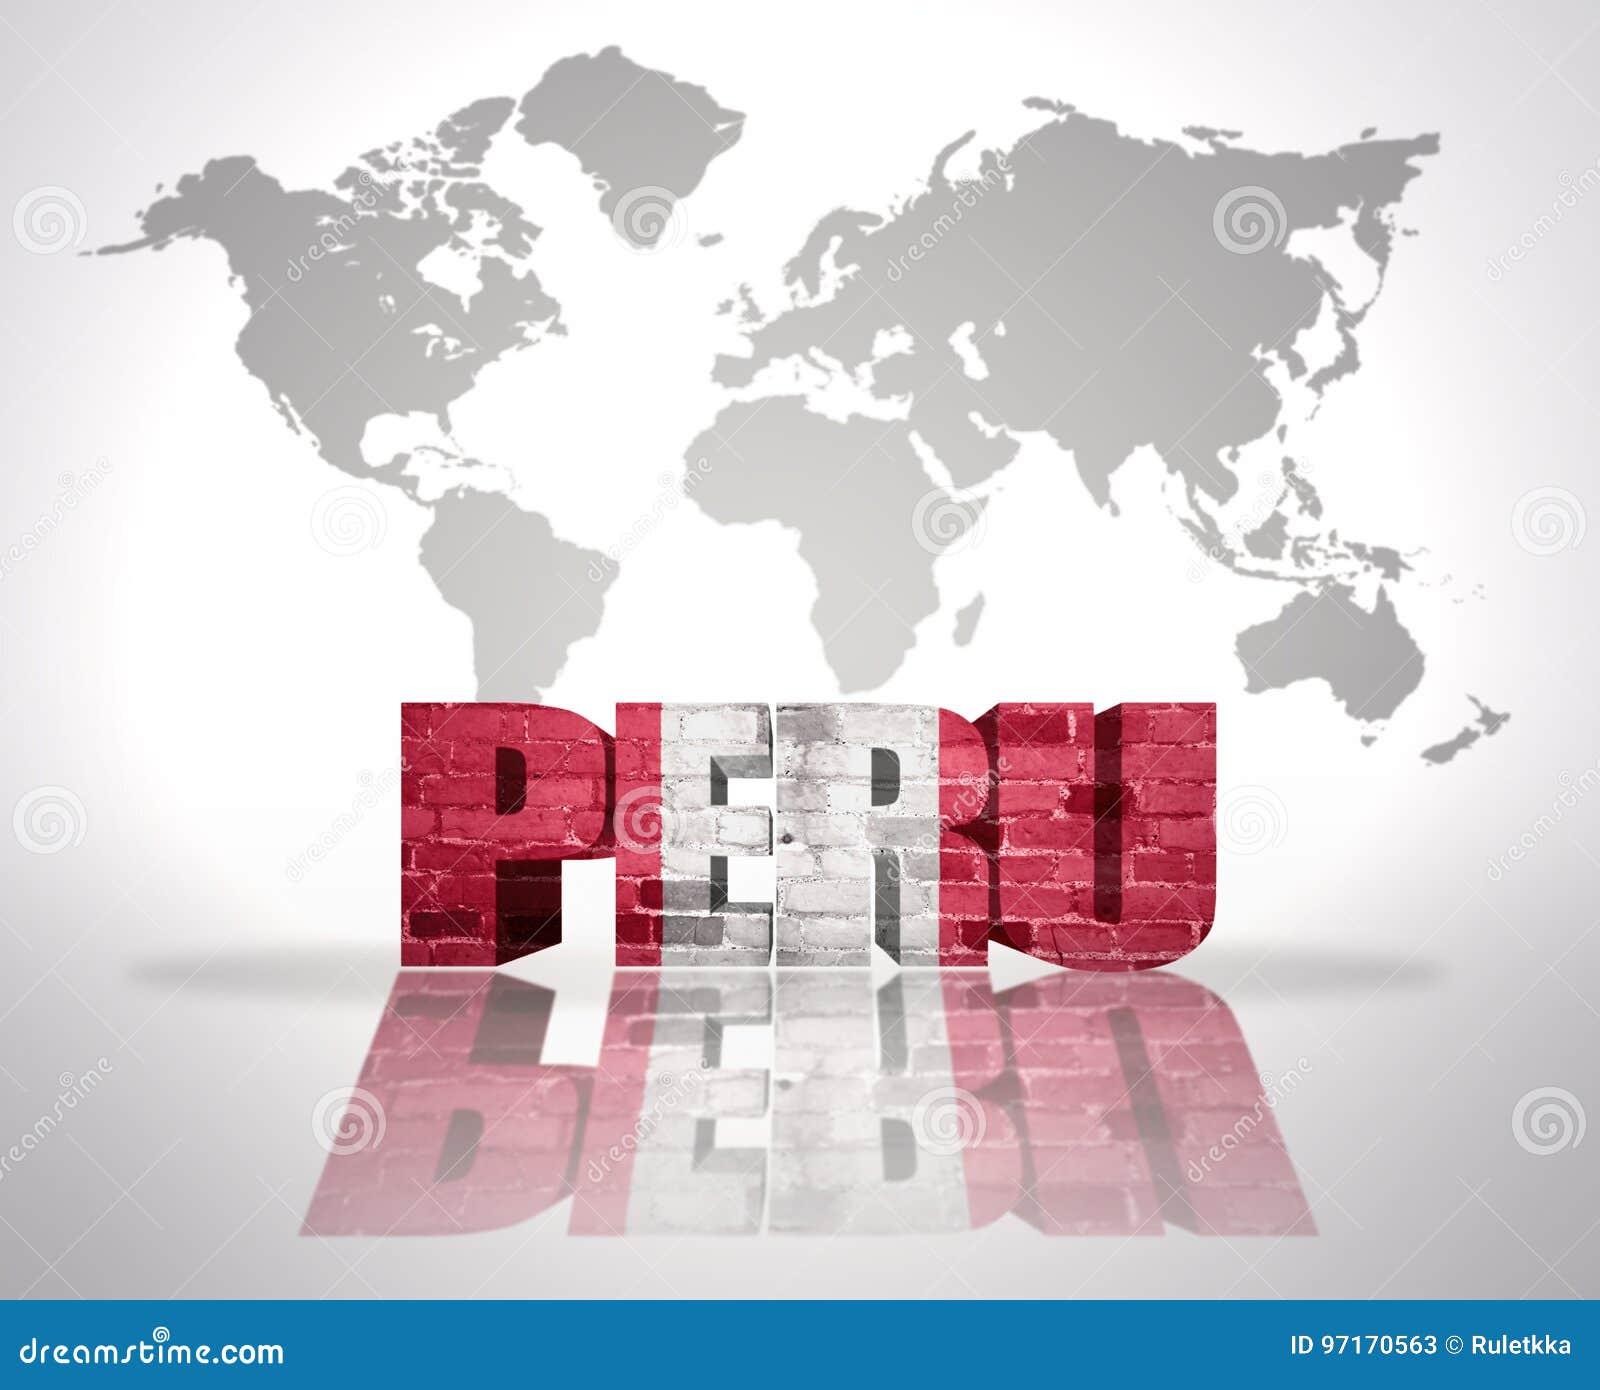 Word Peru On A World Map Background Stock Illustration ...